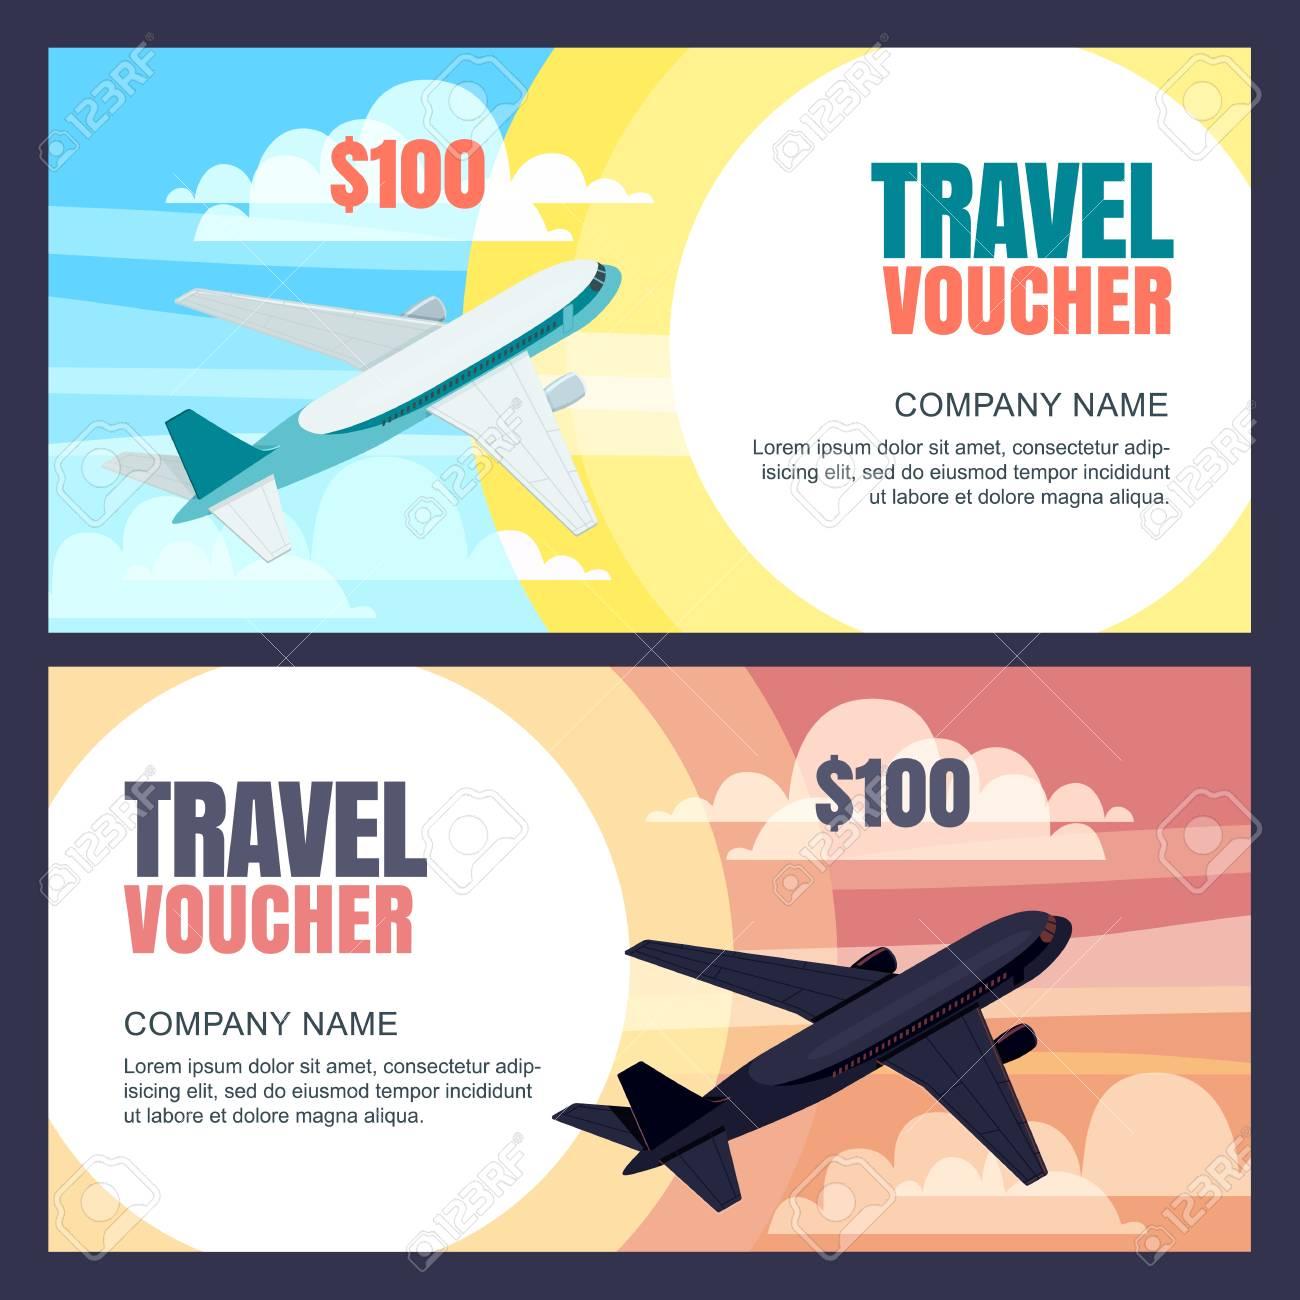 Vector Travel Voucher Template 3d Isometric Illustration Of